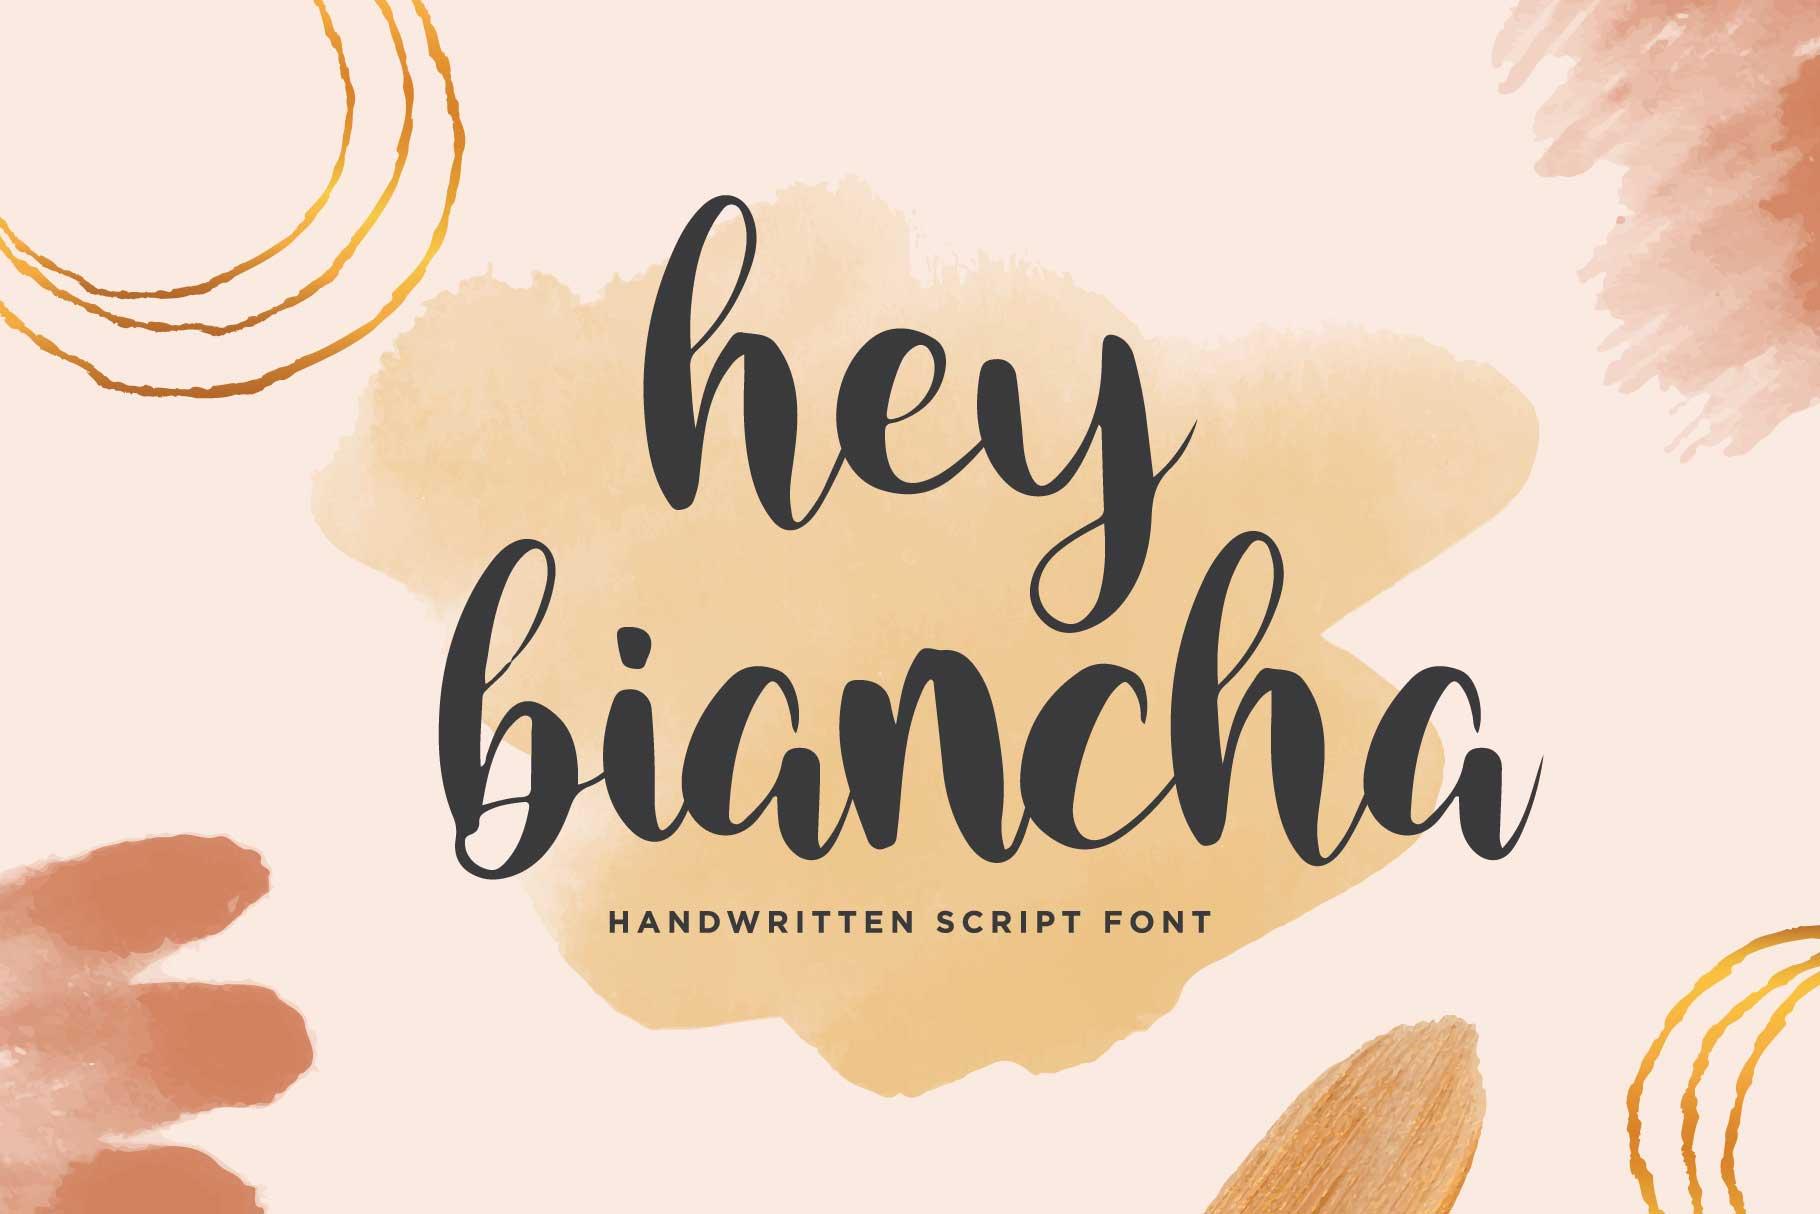 Hey Biancha